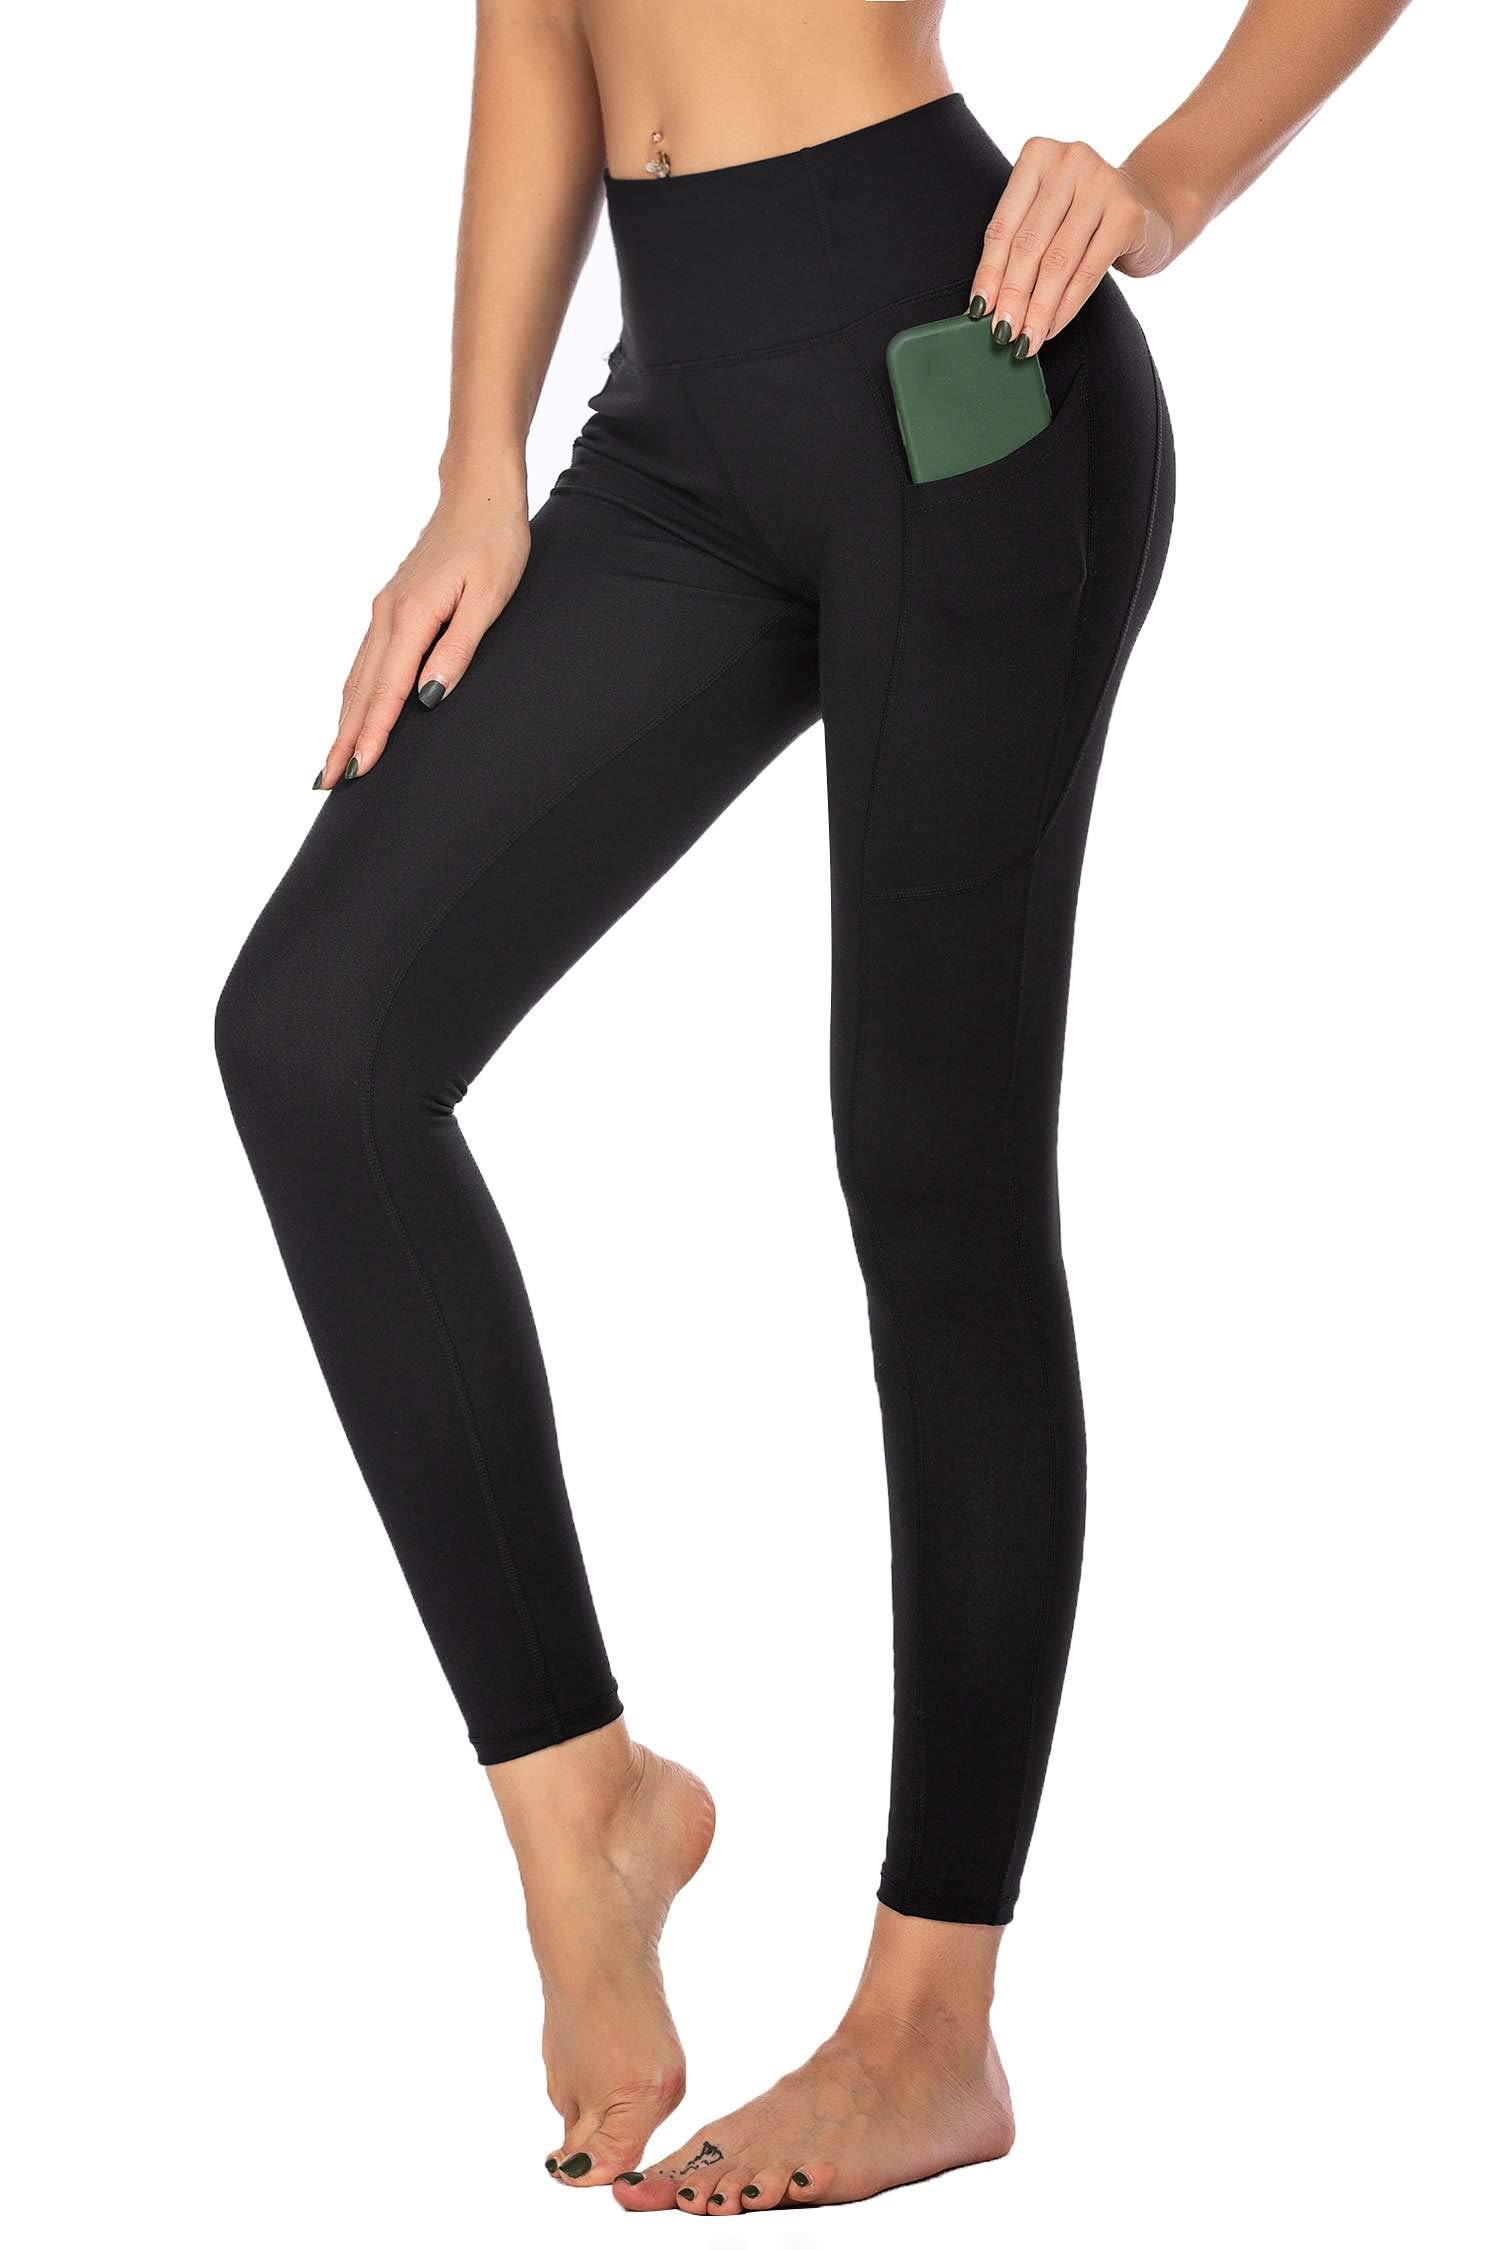 Ekouaer Women's High Waist Yoga Pants Leggings Tummy Control Workout Running Tights with Pockets